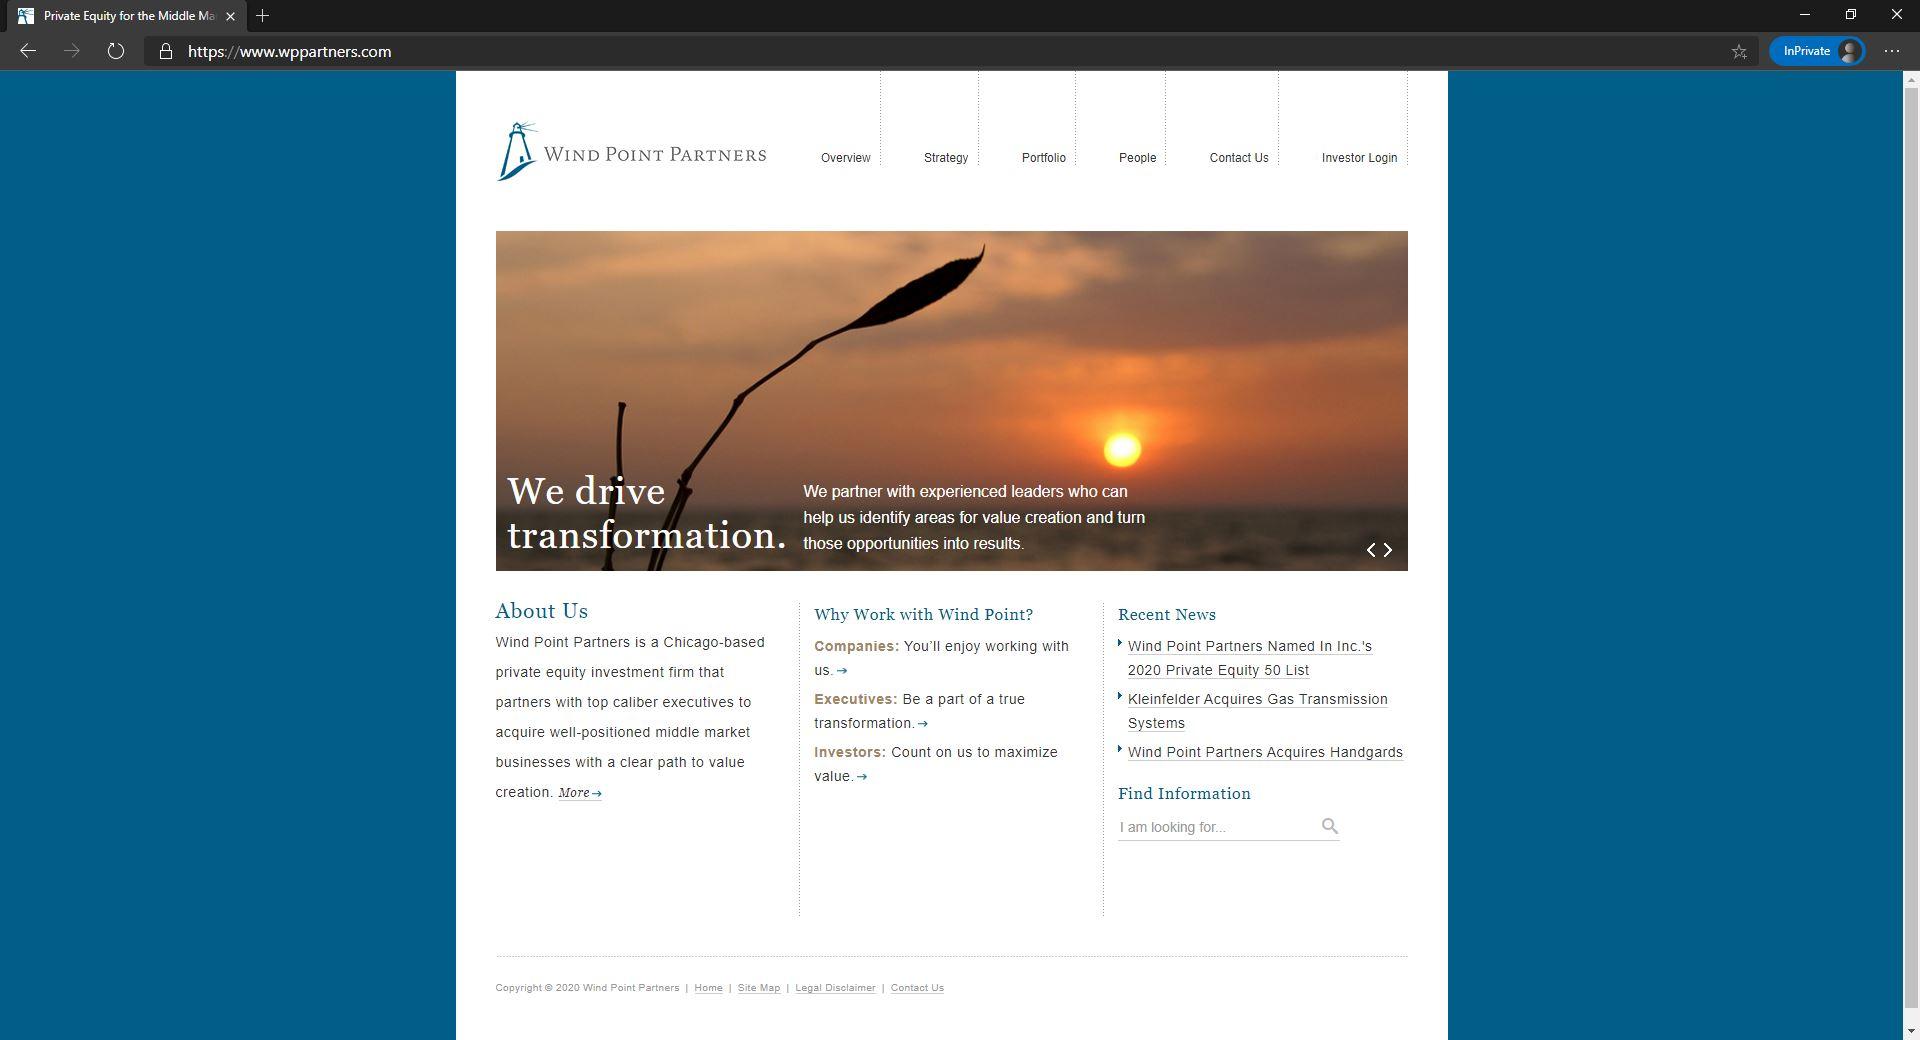 Wind Point Partners website